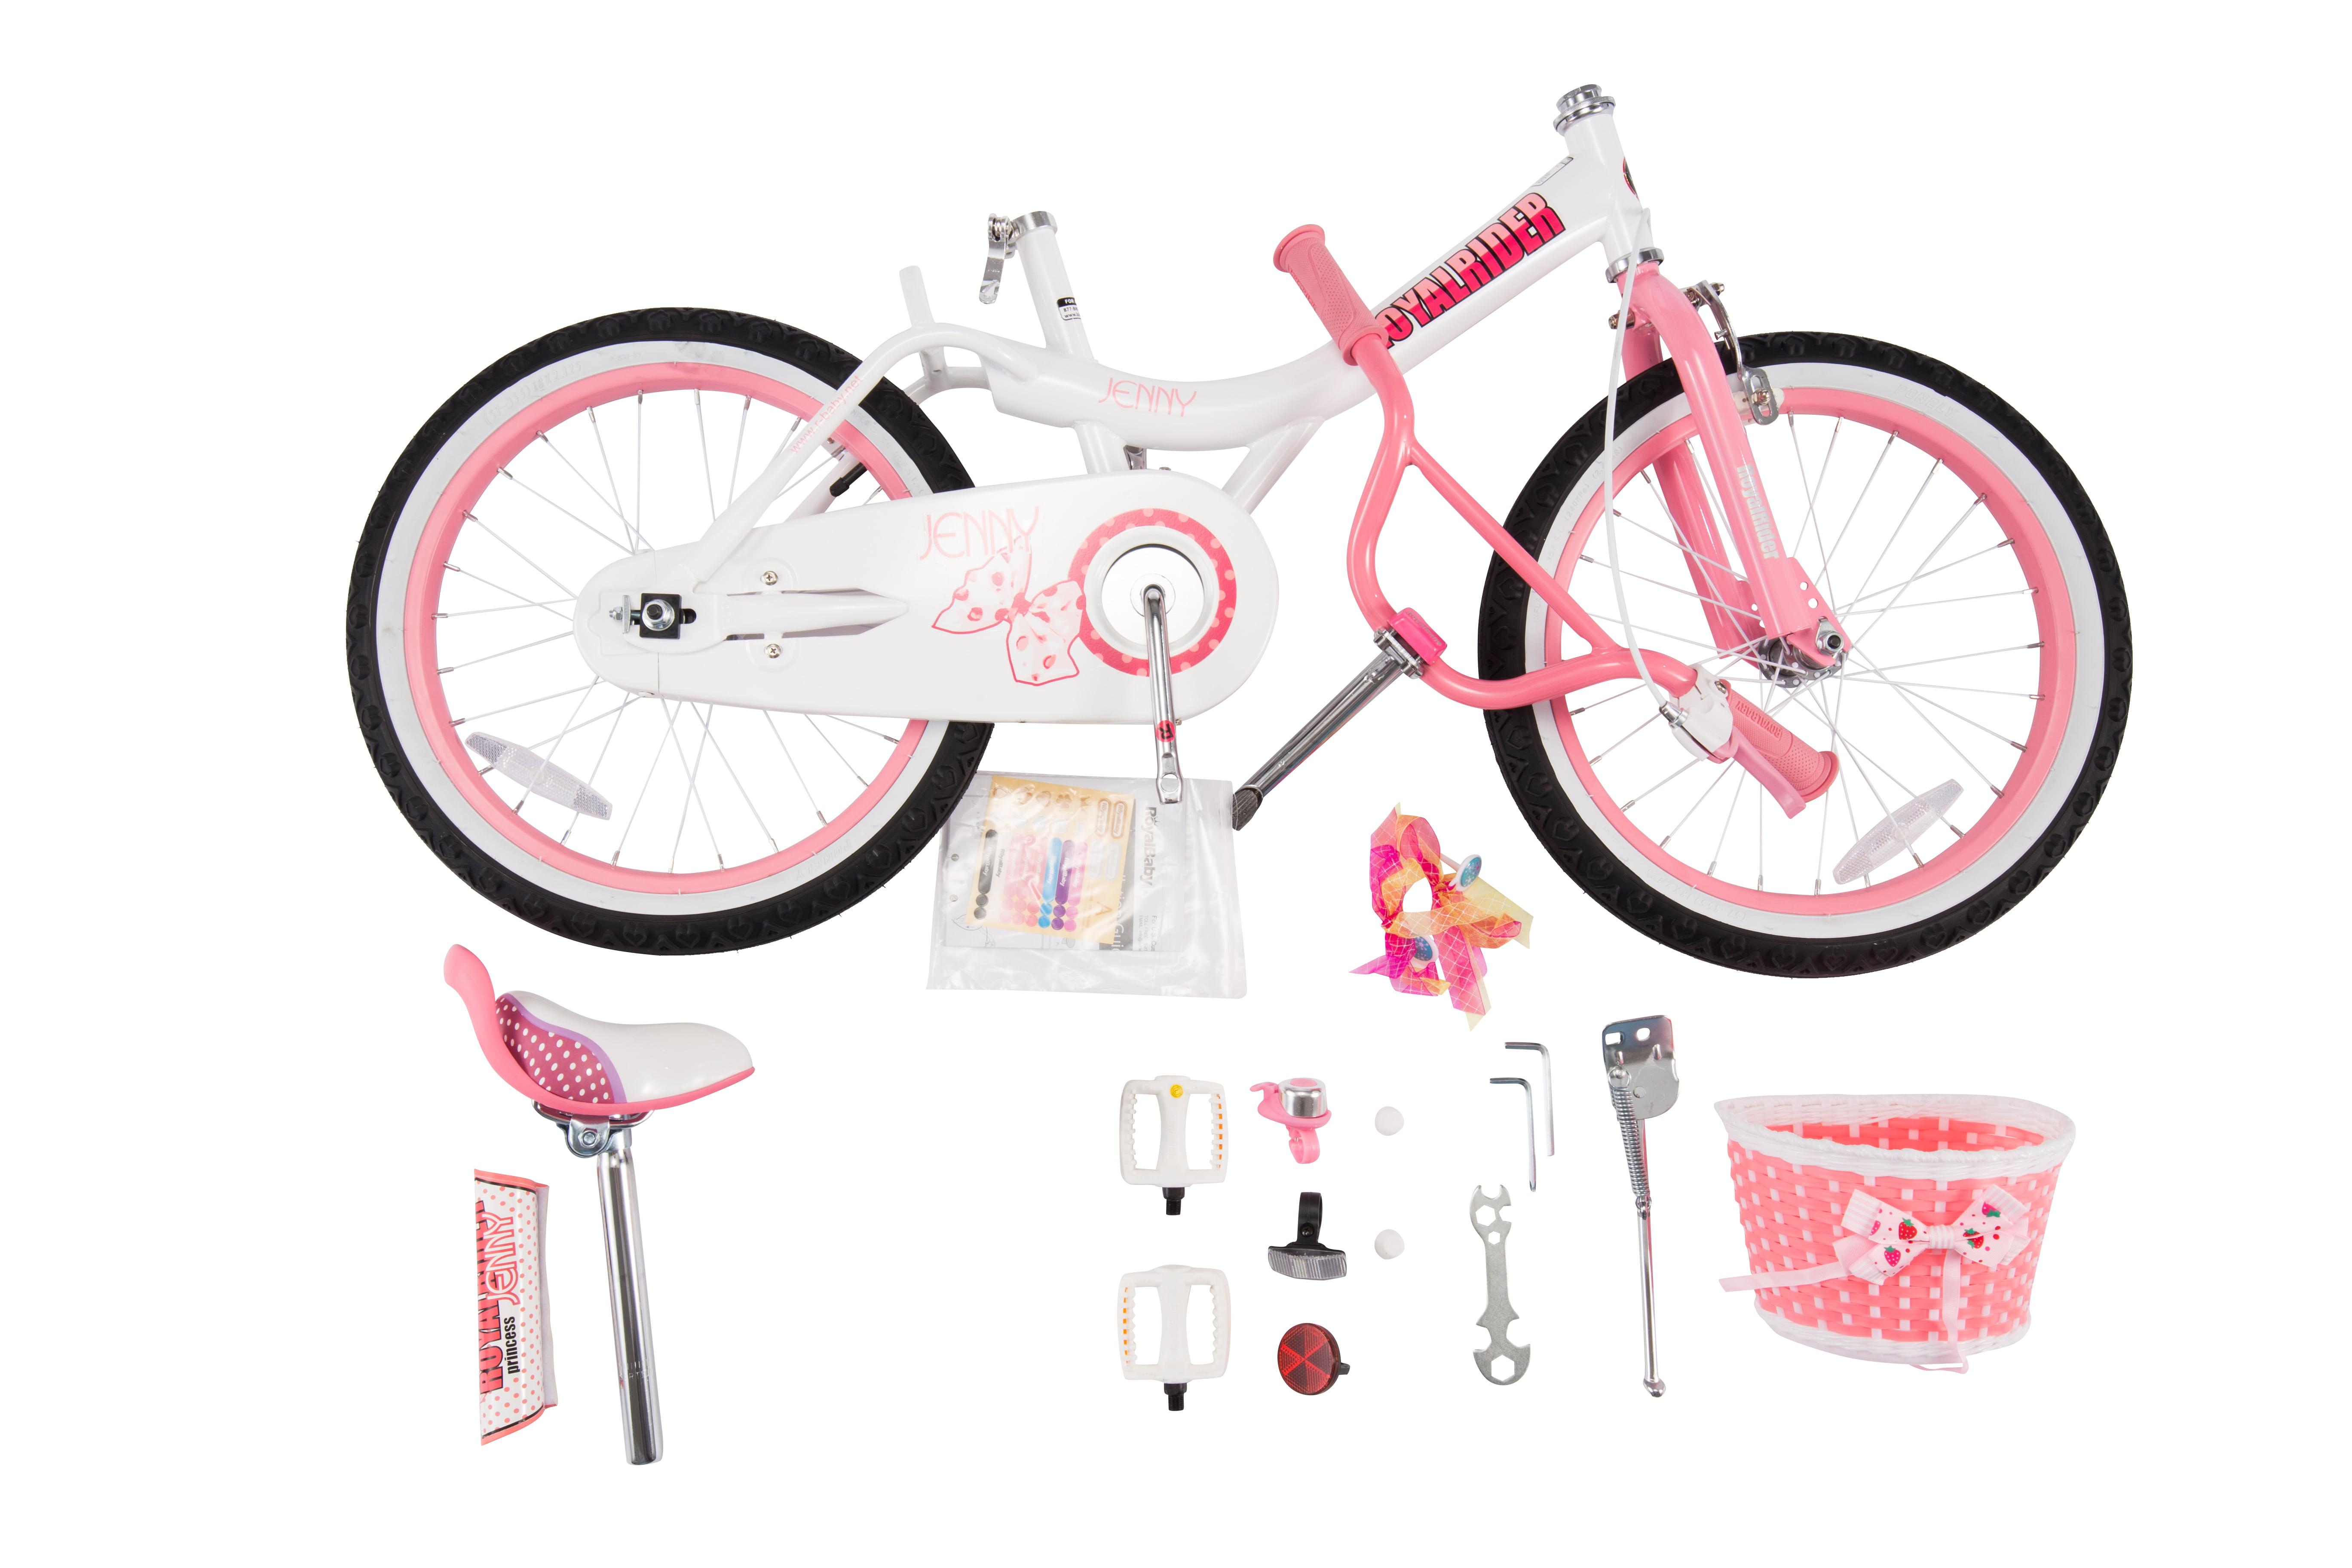 972948654babc Royalbaby Jenny Princess White   Pink 14 inch Girl s Bicycle - Walmart.com